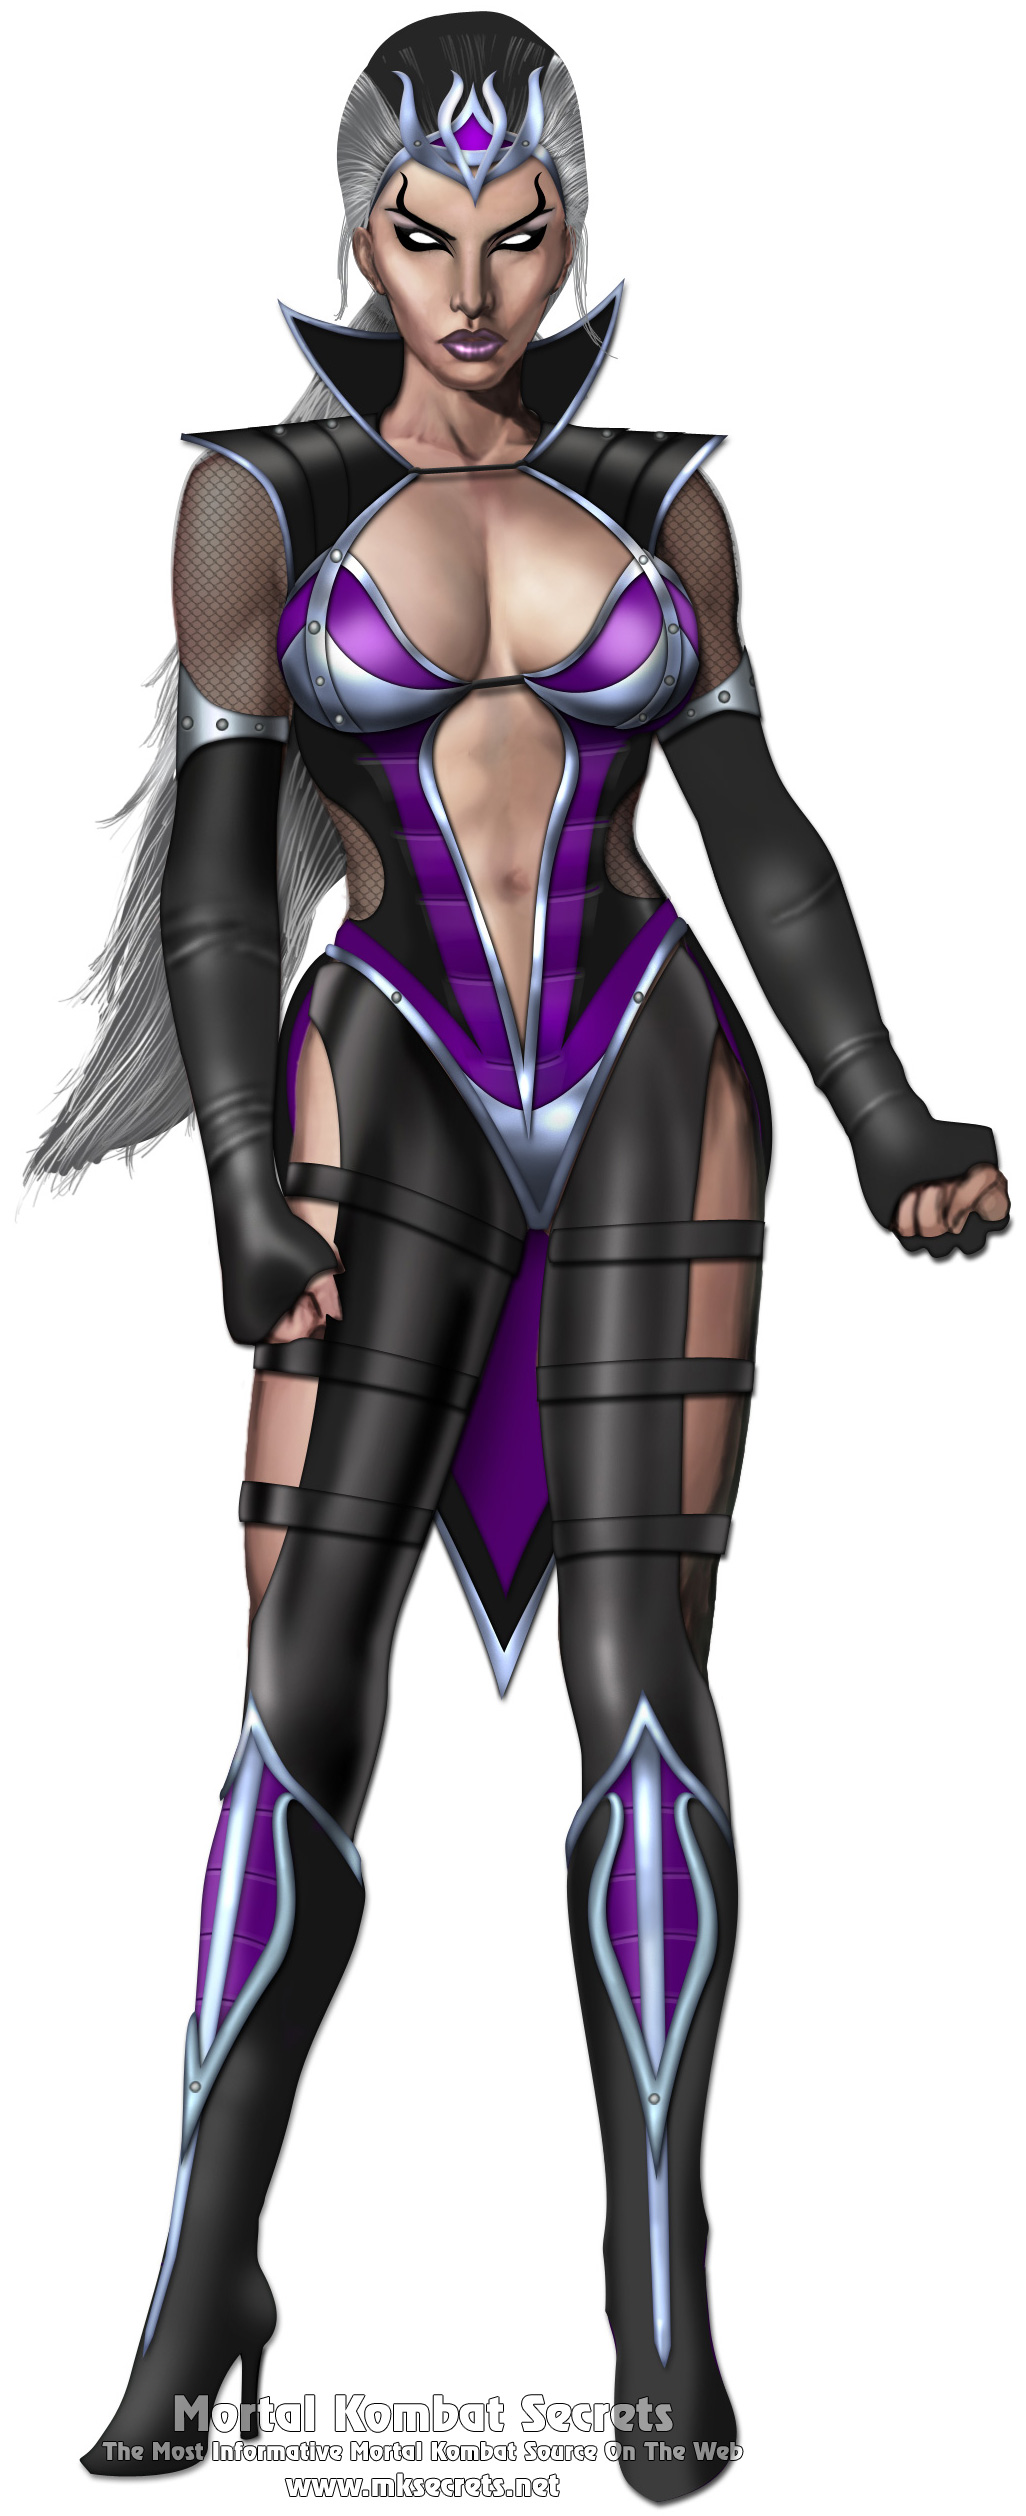 Mortal Kombat 9 (2011) - Character Drawings - Mortal Kombat Secrets